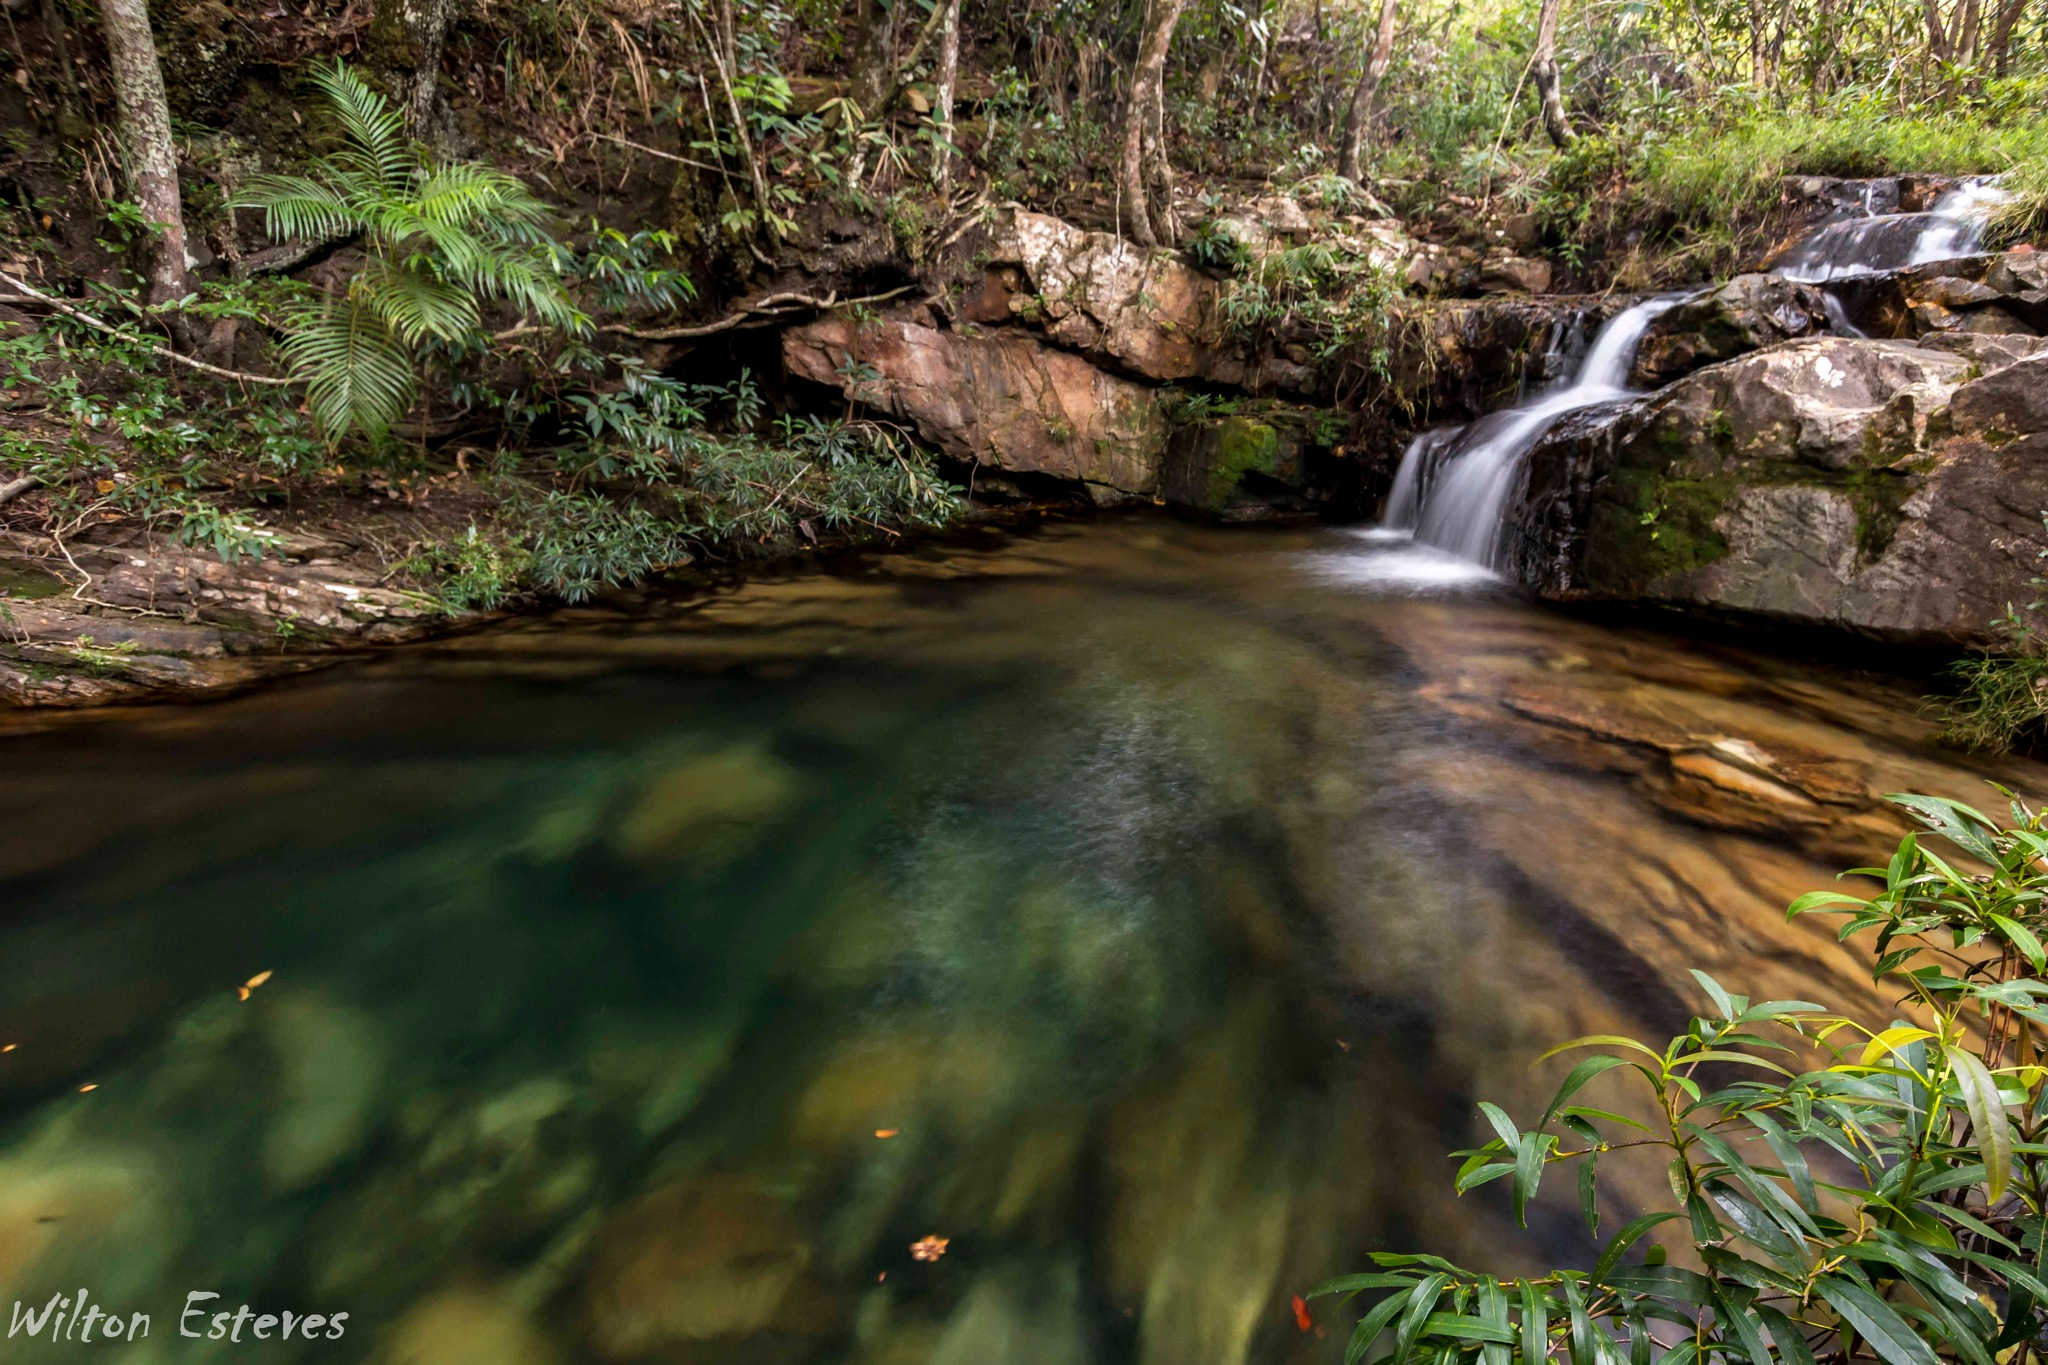 Loquinha Waterfalls by Wilton Esteves